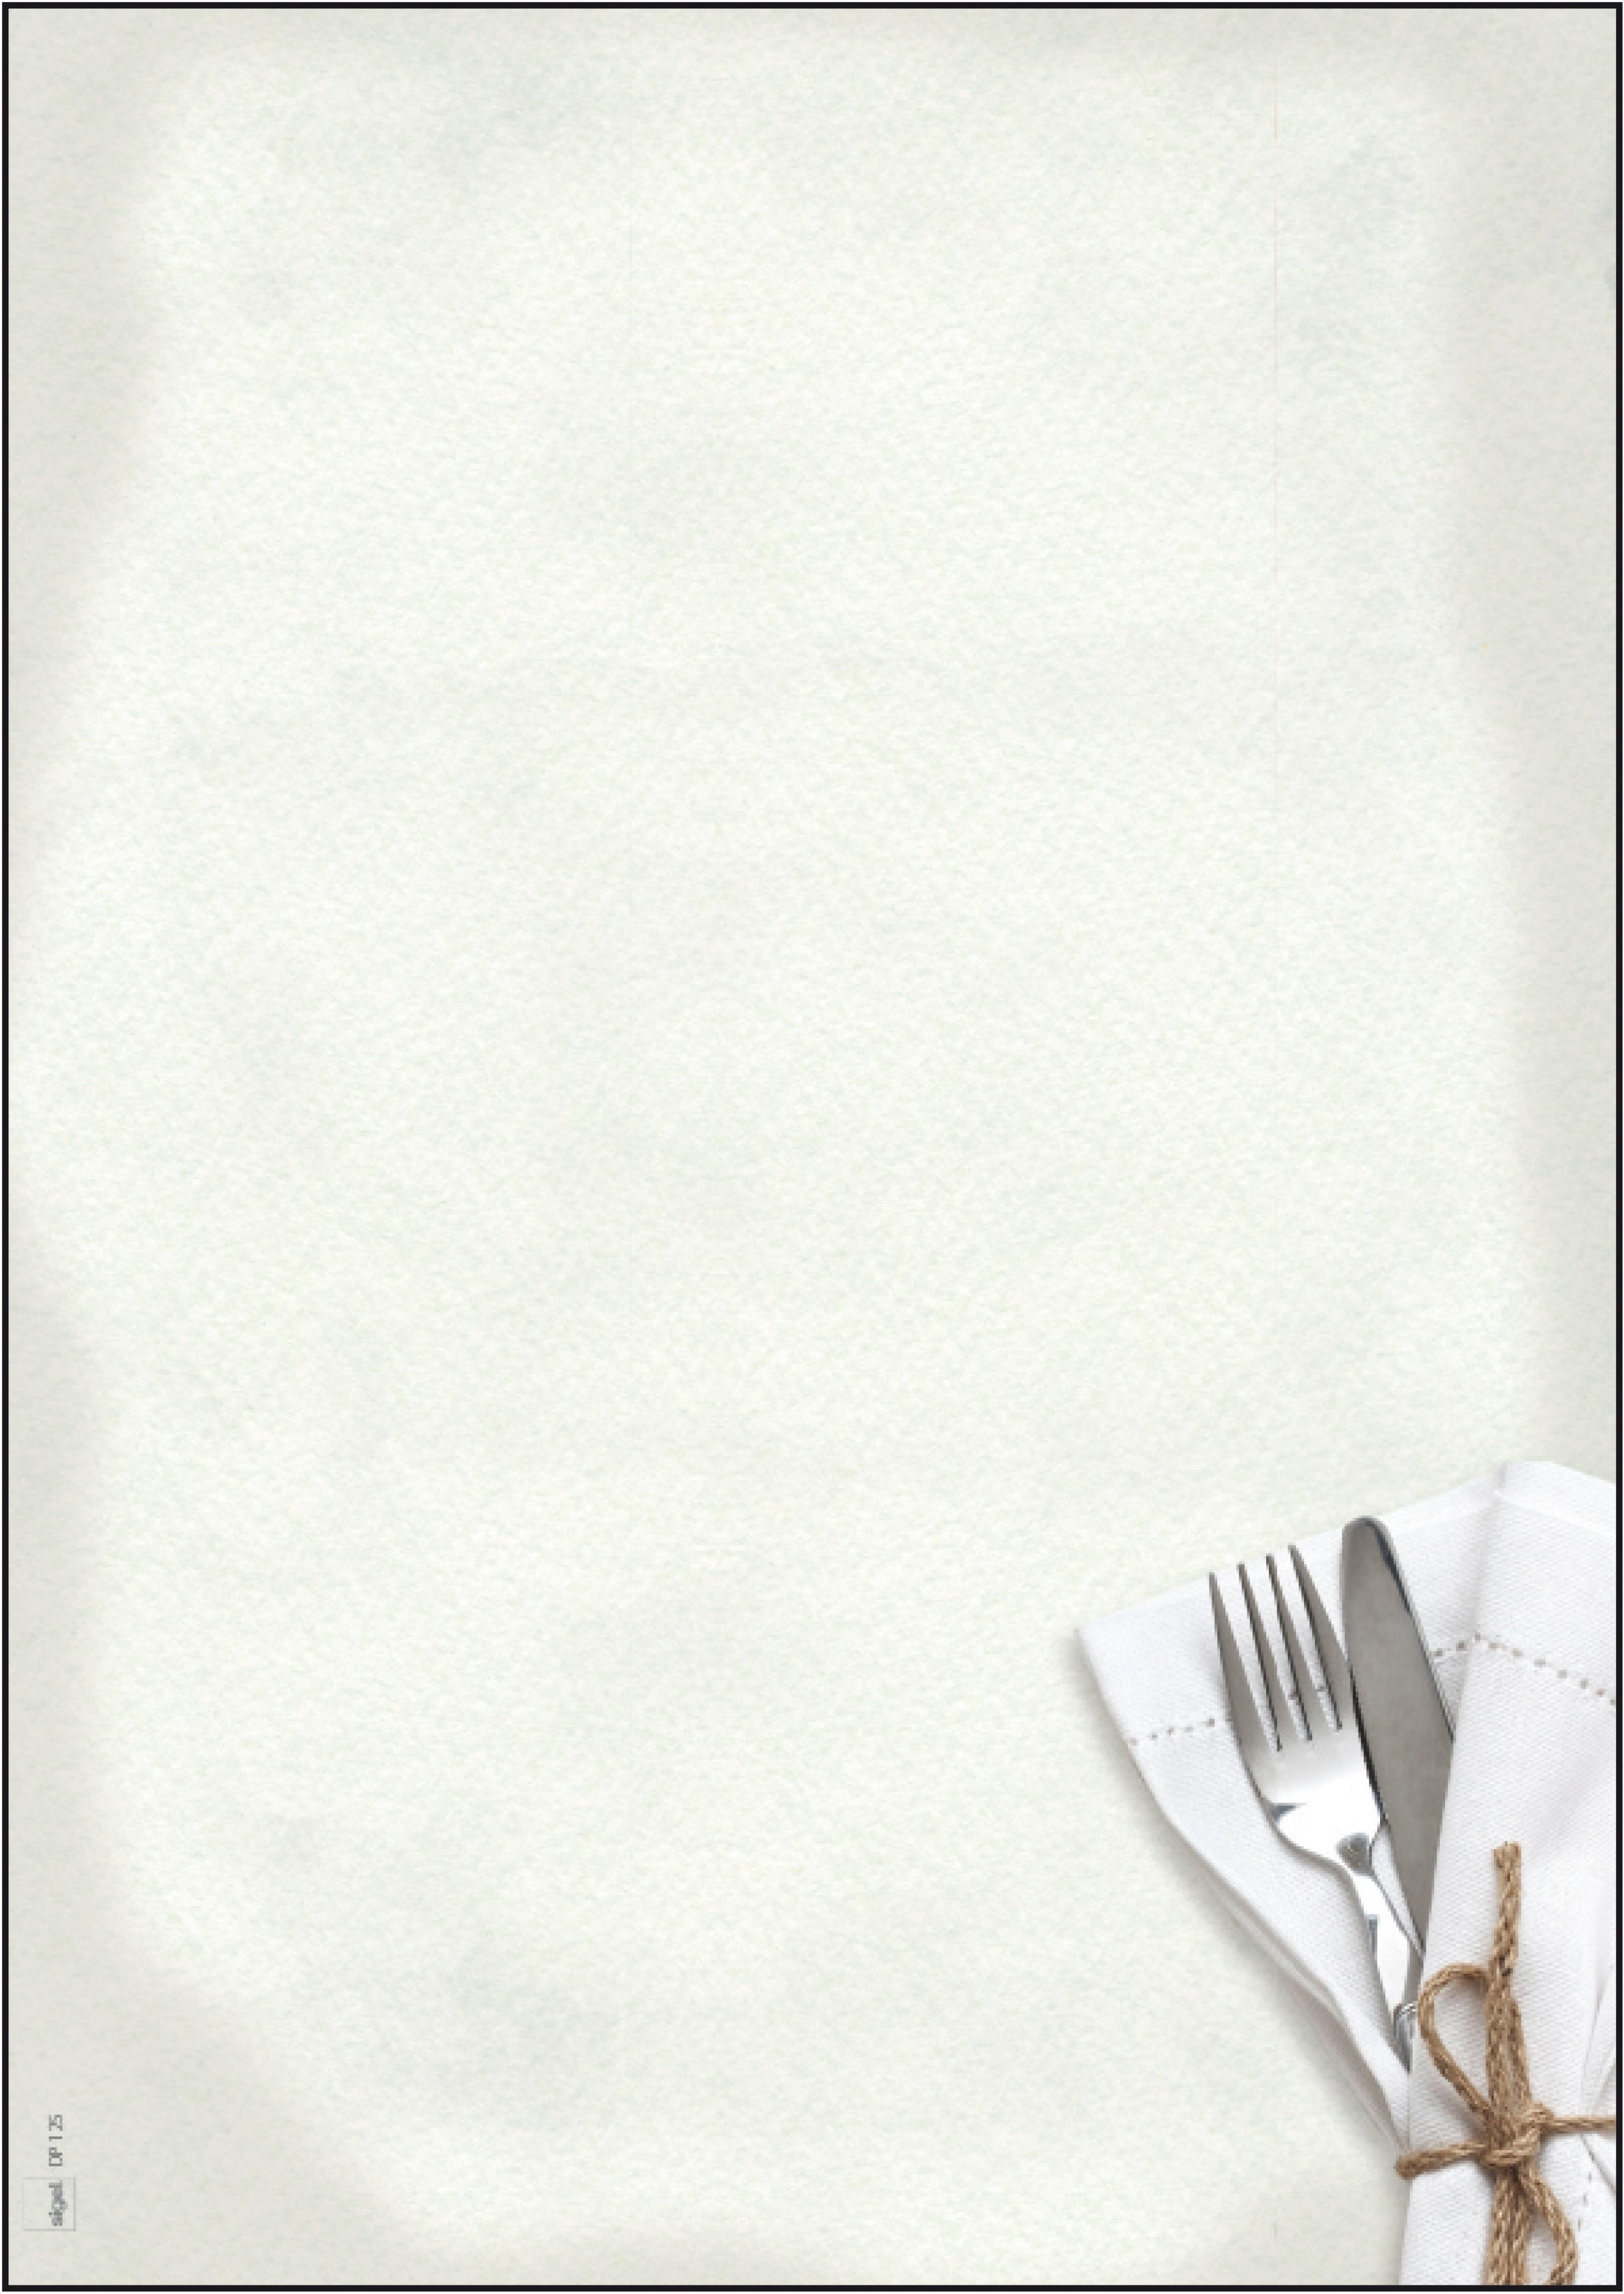 Papier créatif menu restaurant